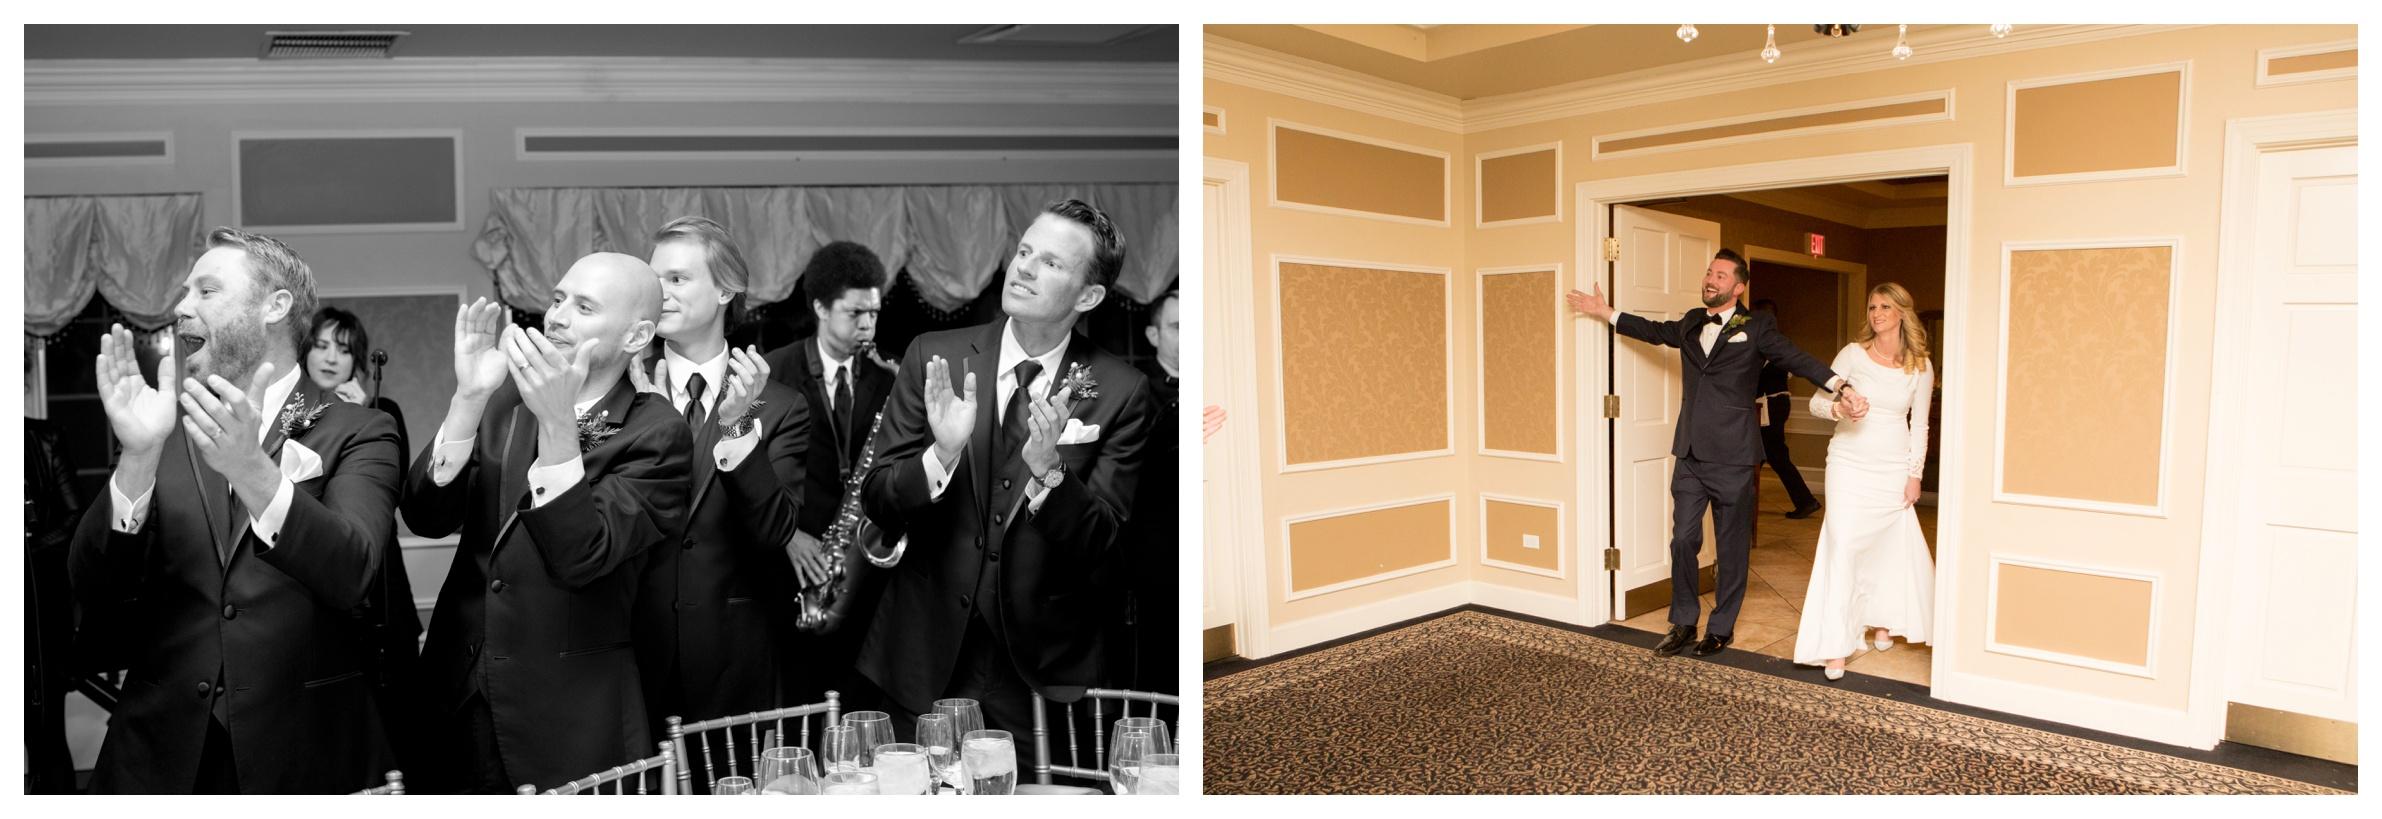 st-charles-country-club-wedding